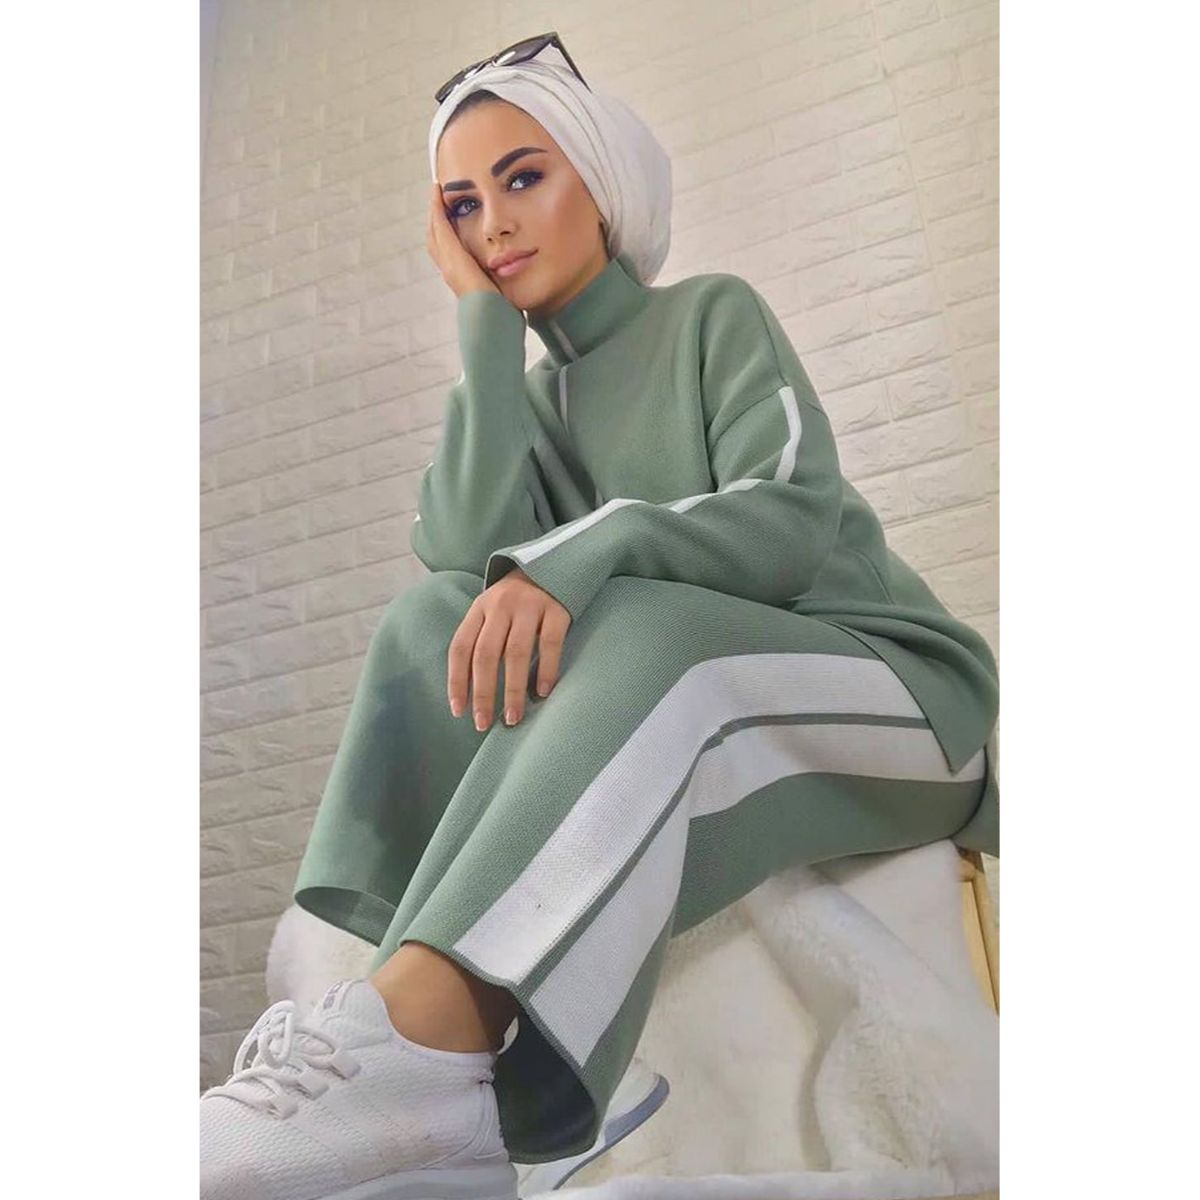 2 Pieces Knitwear Stripe Detailed Muslim Women's Double Muslim Set Pullover and Pants Trousers Muslim Fashion Turkey Dubai 2021